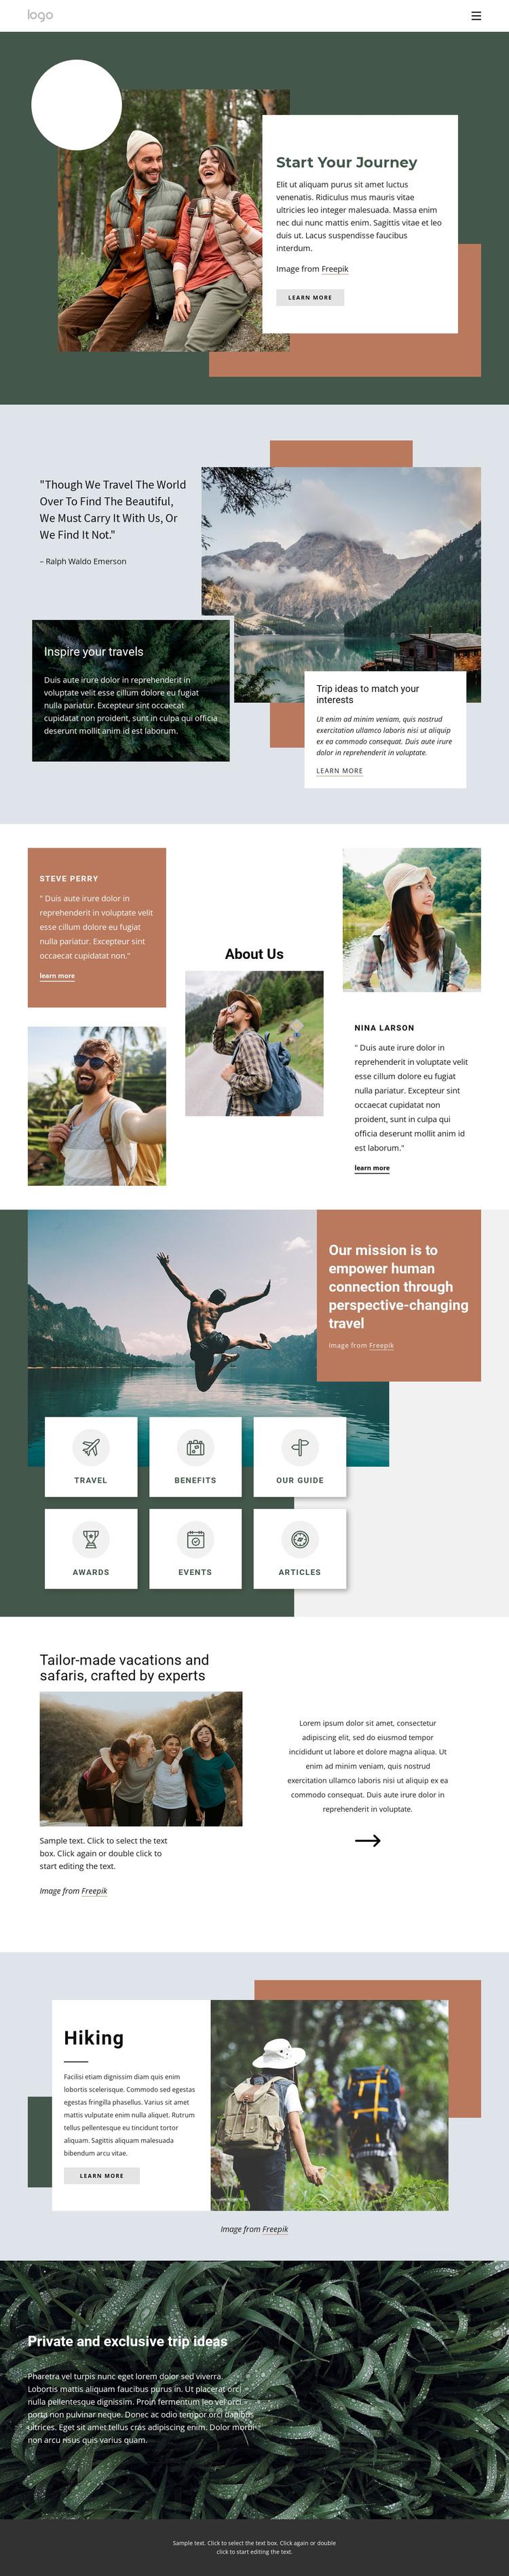 Adventure travel company Template